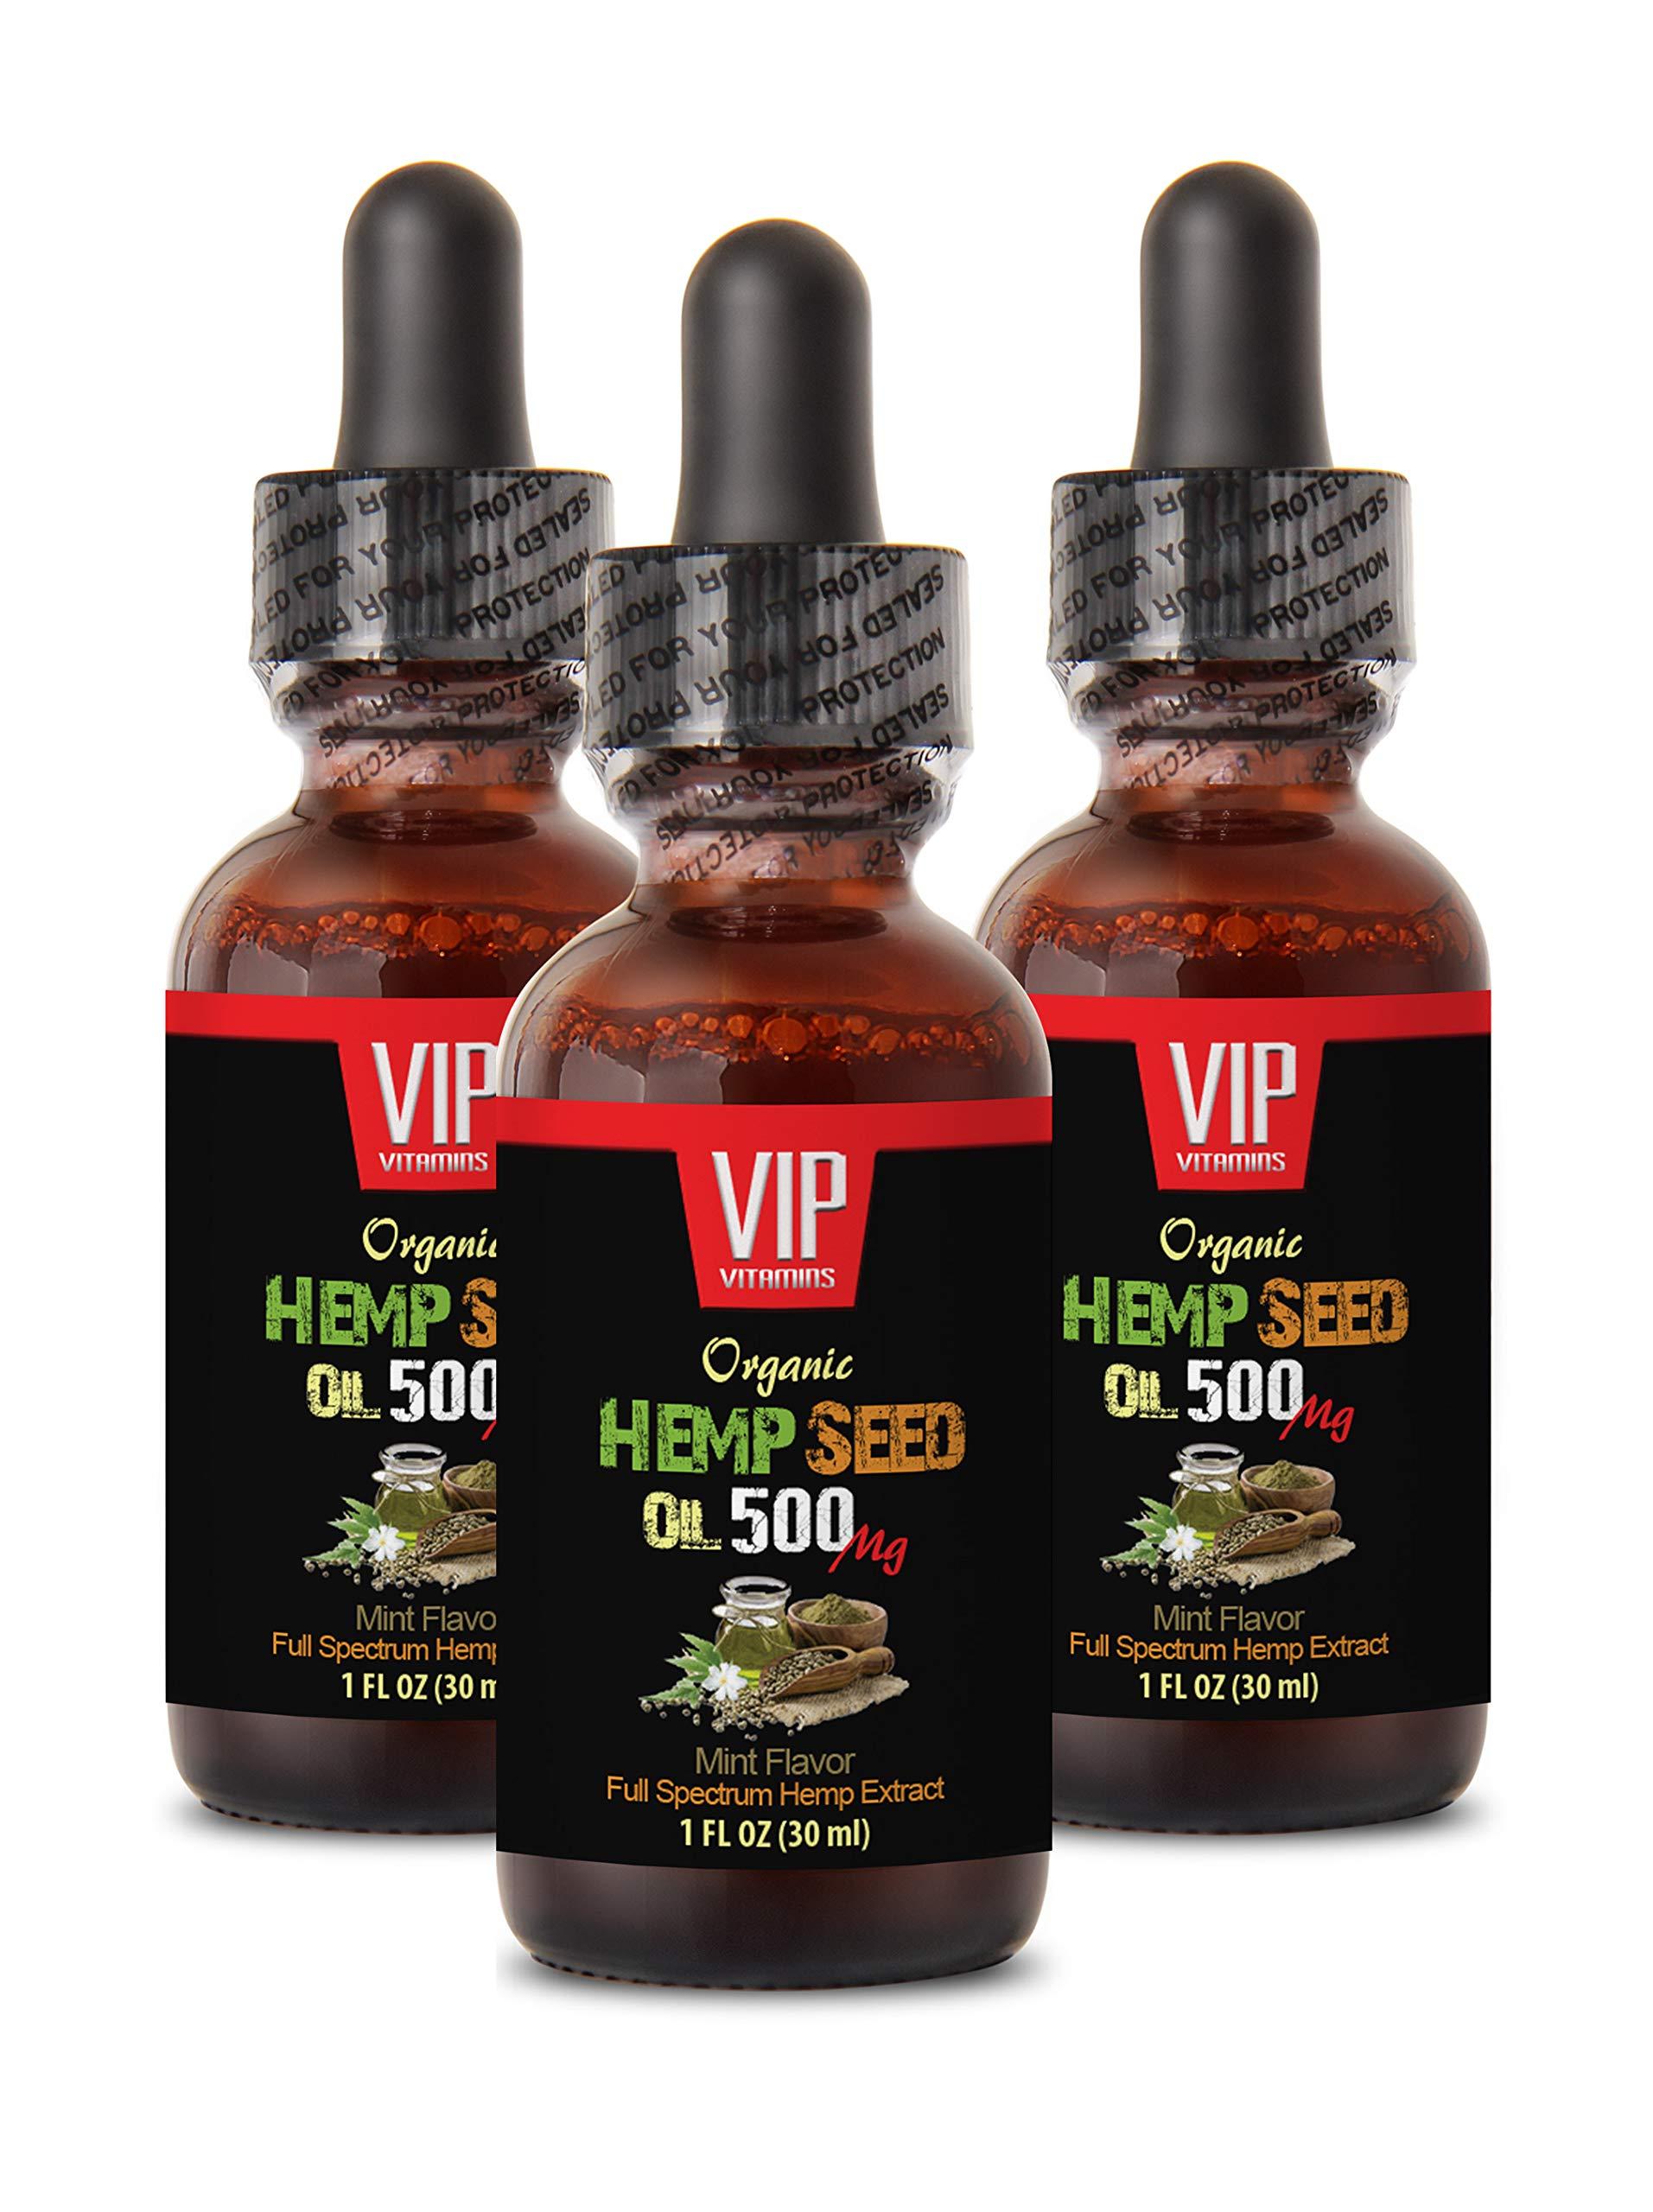 Inflammation Supplements for Men - Hemp Seed Oil 500 MG Organic - Hemp Oil for Blood Pressure - 3 Bottles 3 FL OZ (90 ML)